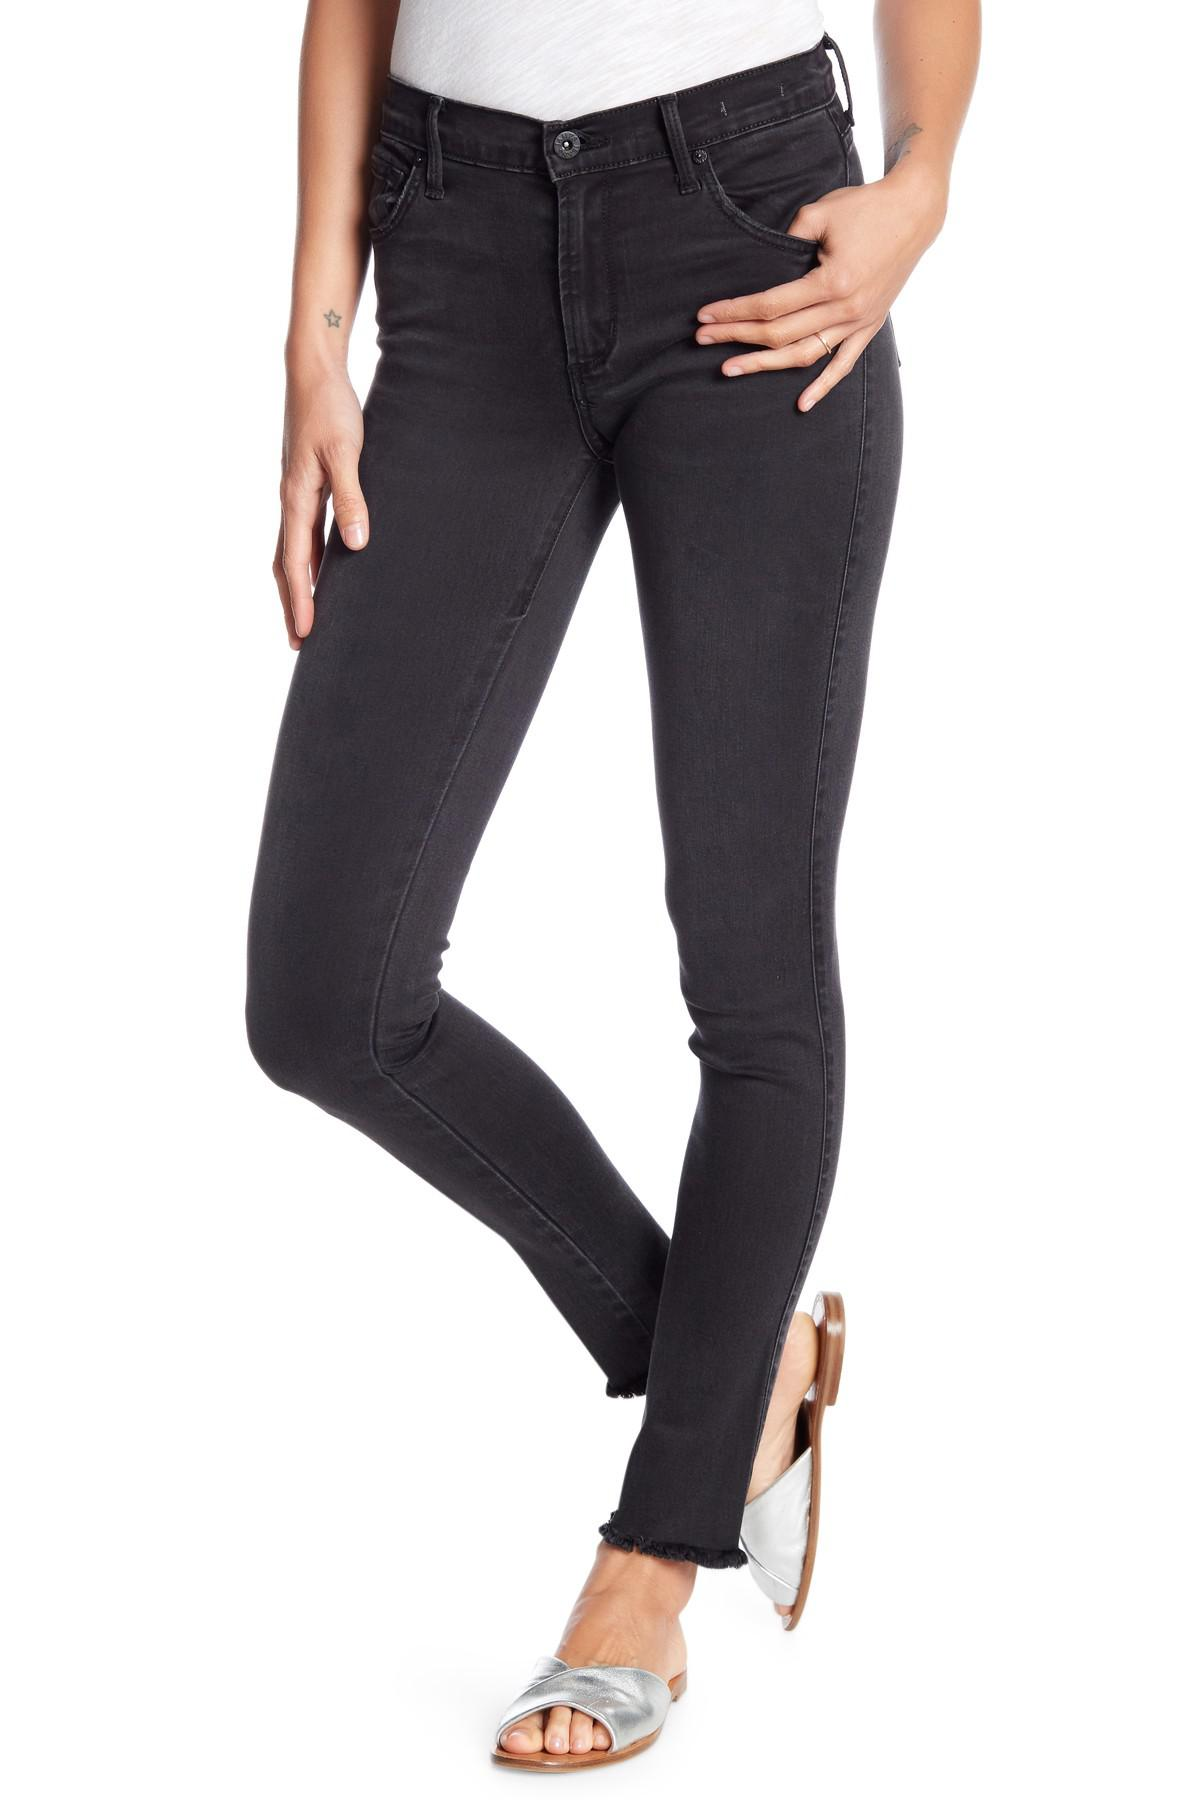 James Jeans Womens J Twiggy Ankle Jean with Released Hem in Smoke